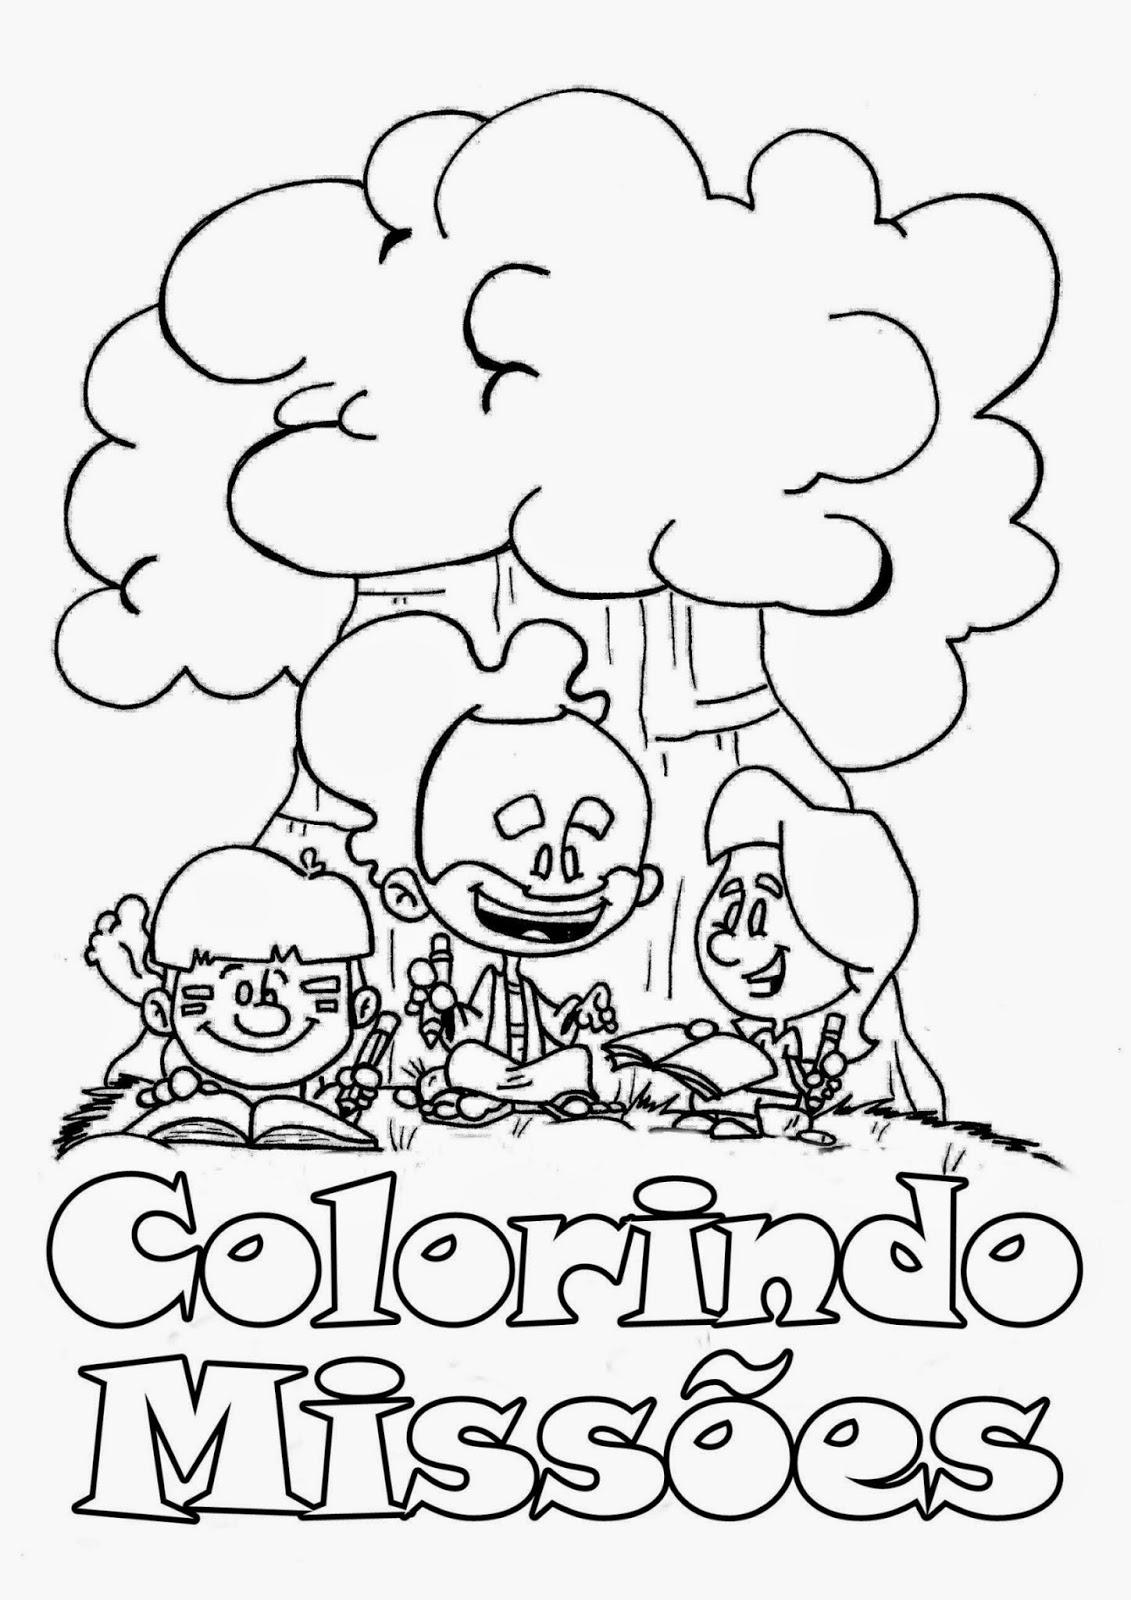 Muito Webservos : Estudos : COLORINDO MISSÕES- Revista infantil gratuita  RQ98